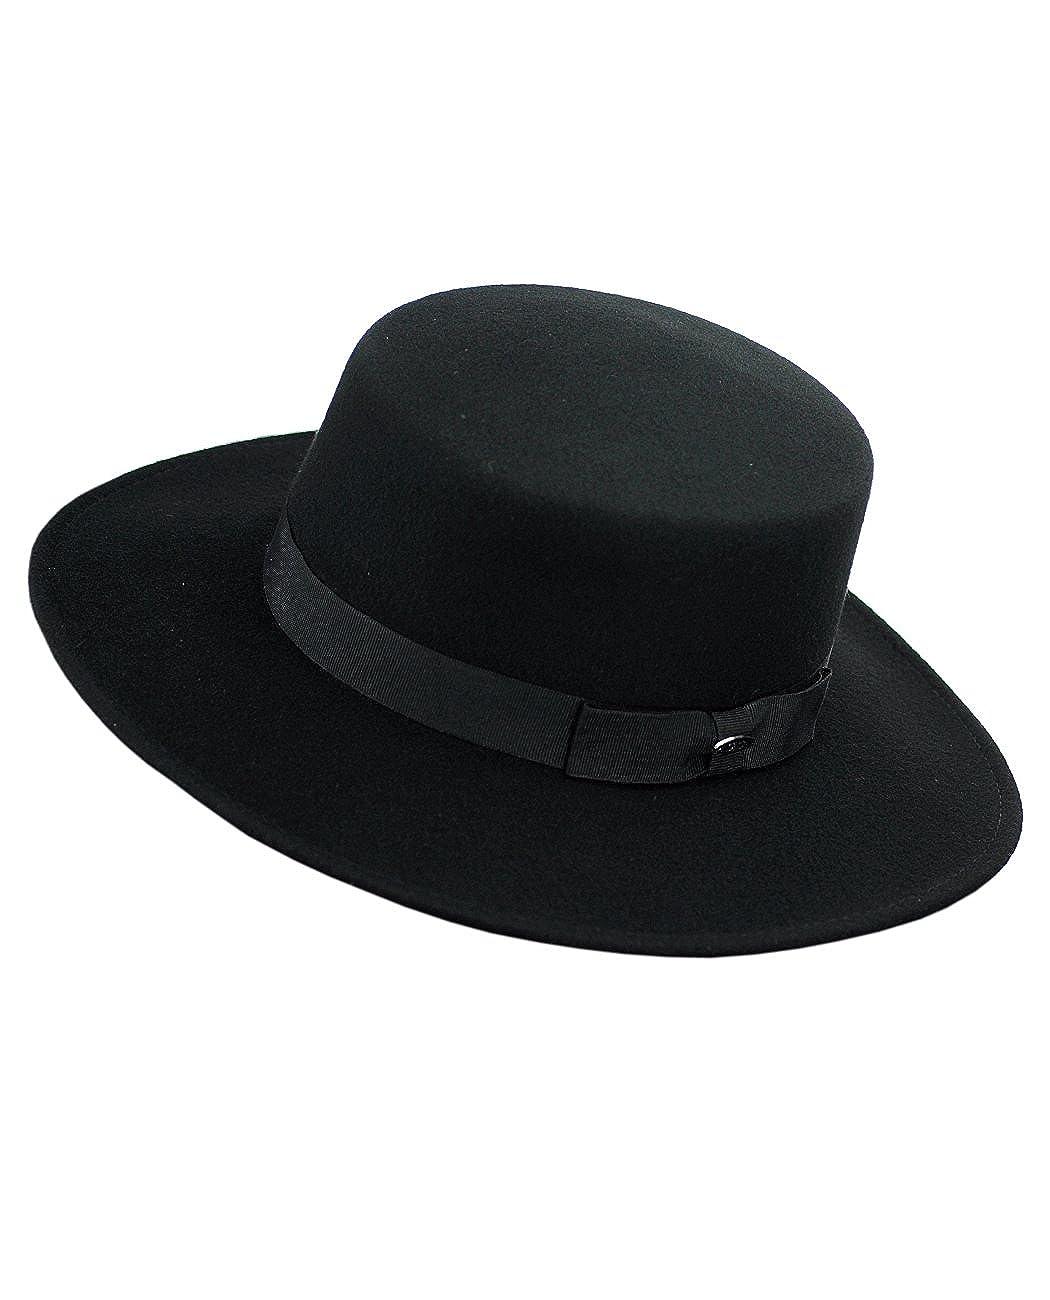 Women's Vintage Hats | Old Fashioned Hats | Retro Hats  Wool Wide Brim Porkpie Fedora Hat w/Simple Band Accent NYFASHION101 $39.99 AT vintagedancer.com